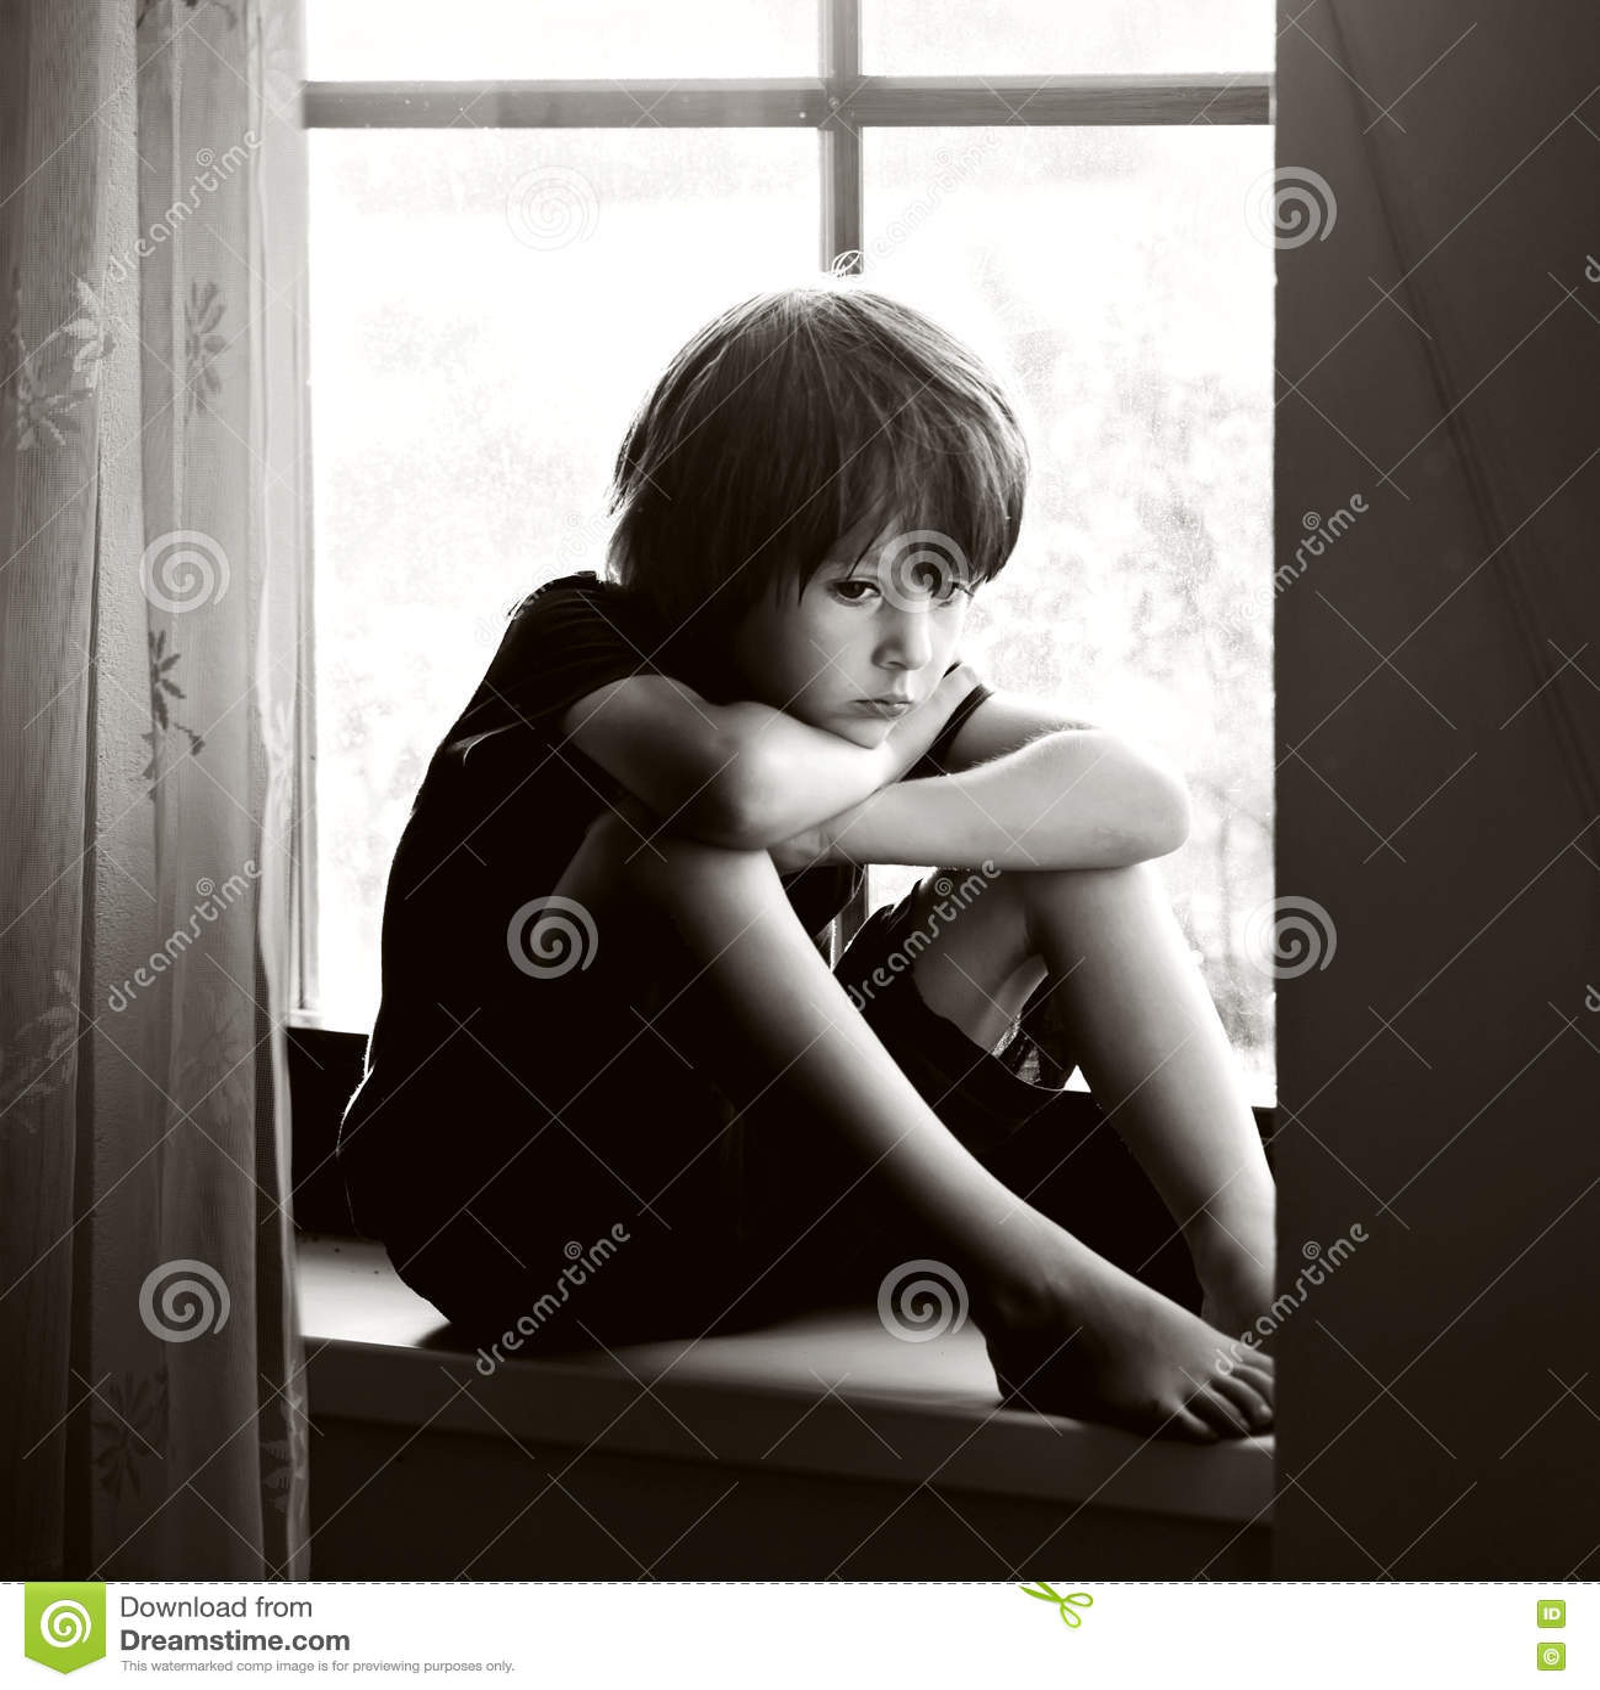 Sad Boy Alone Quotes: Sad Child, Boy, Sitting On A Window Shield Stock Photo